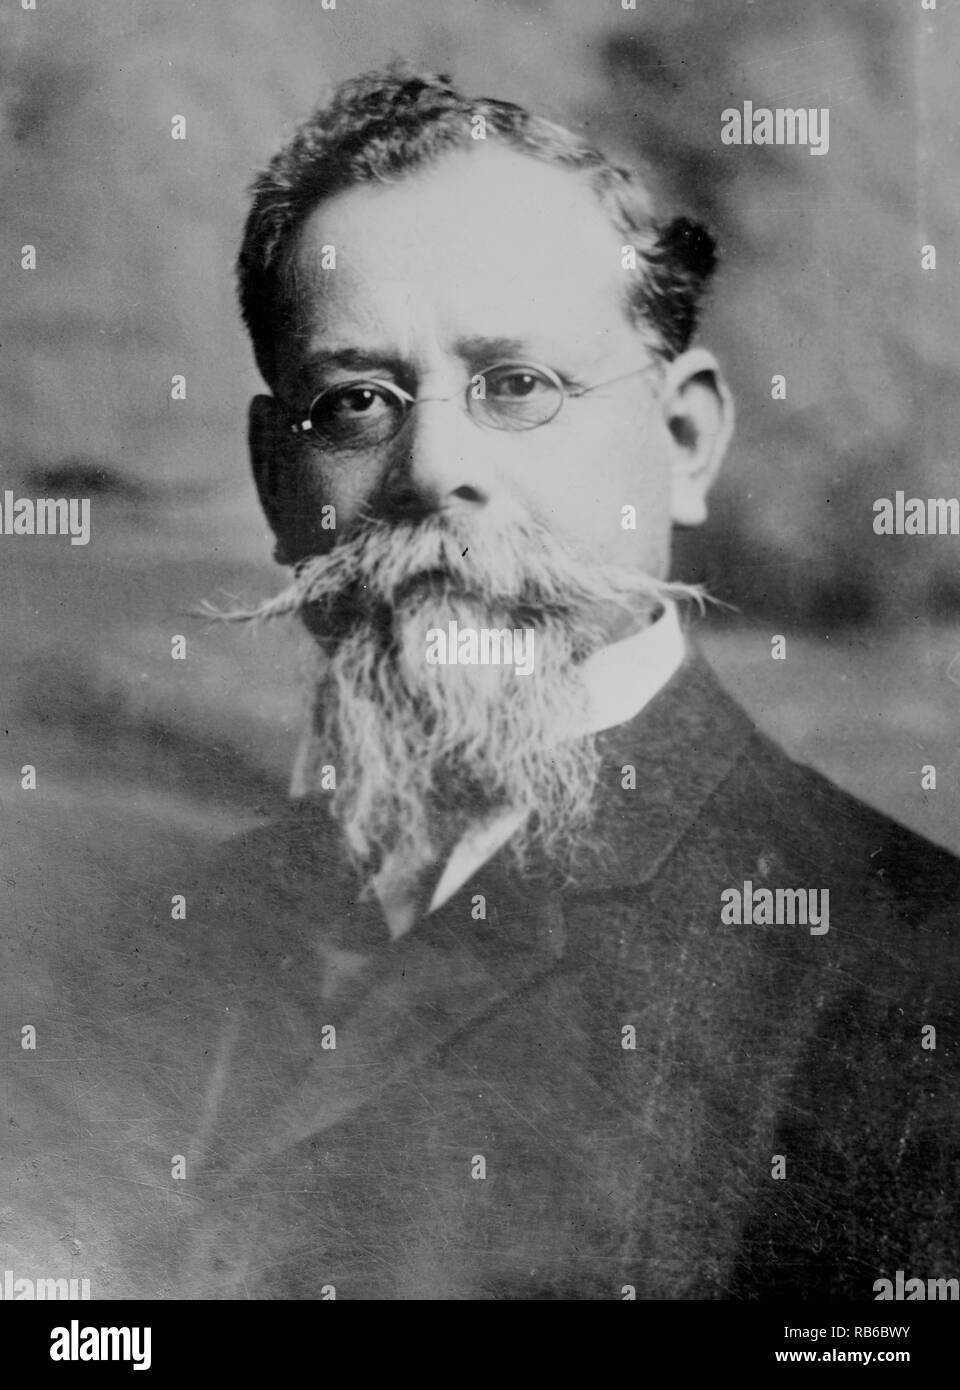 Venustiano Carranza de la Garza (1859-1920), a leader of the Mexican Revolution who became 37th President of Mexico in 1914. - Stock Image